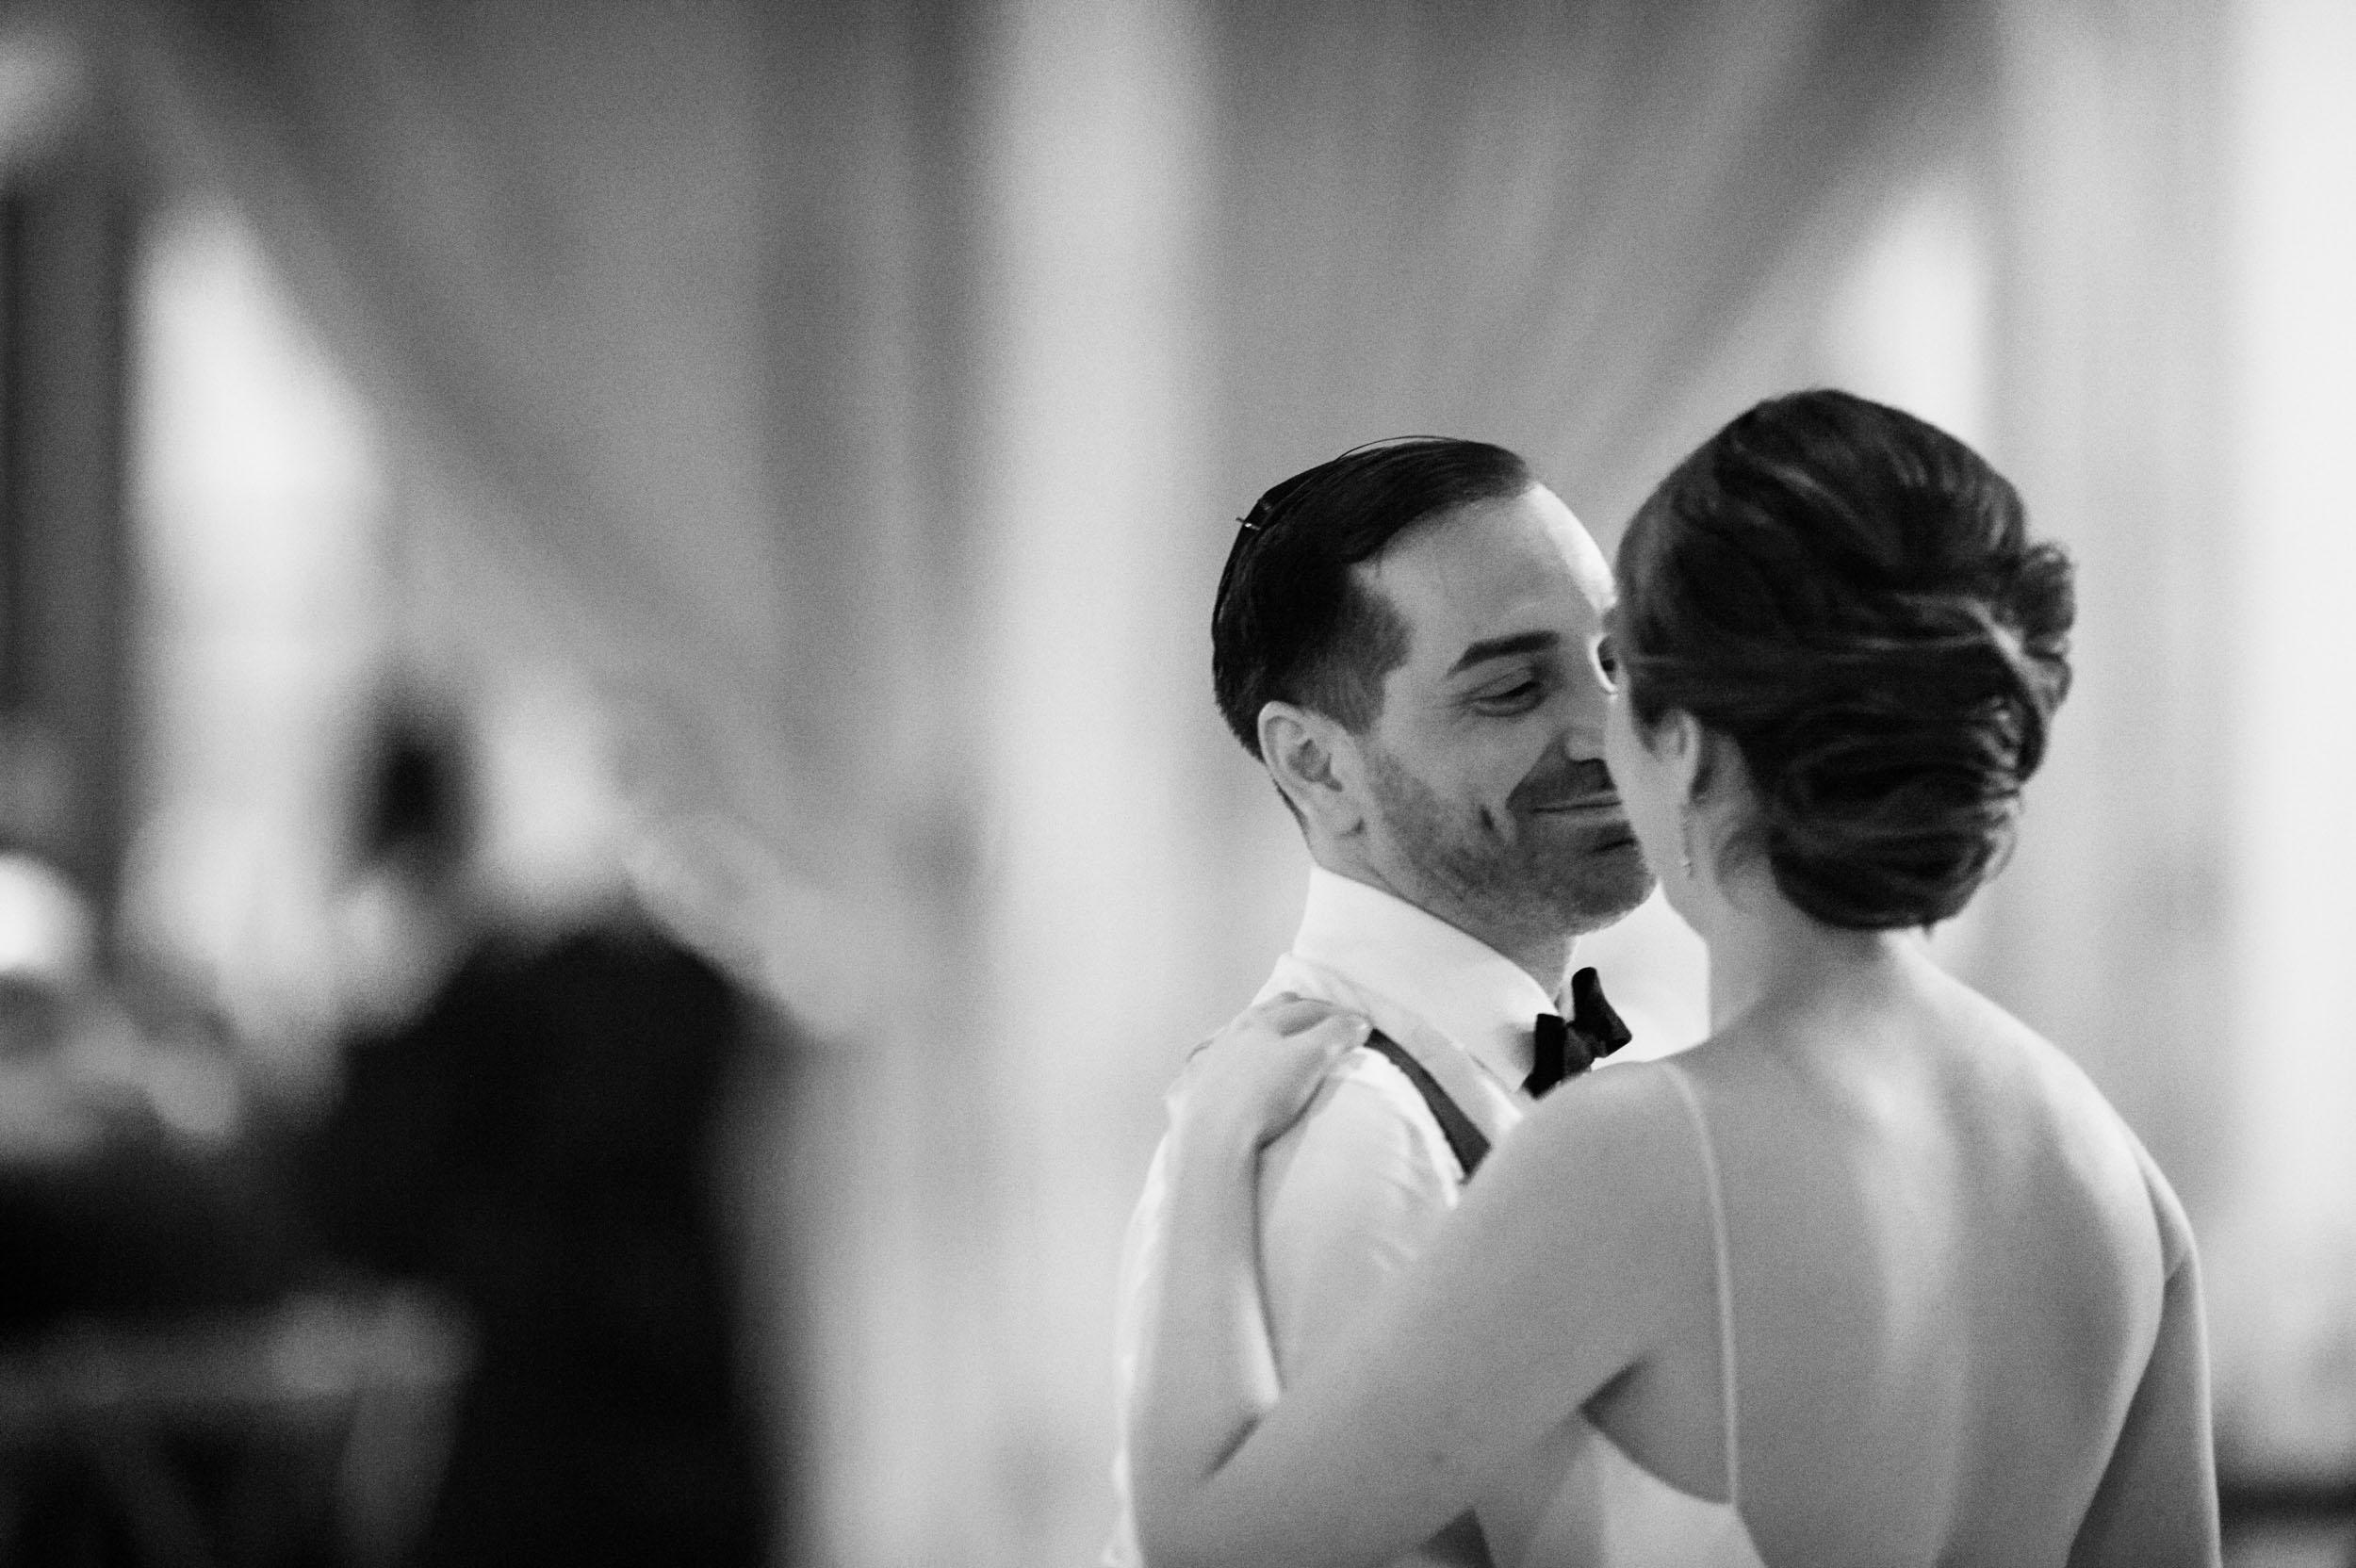 Bride and groom's first dance at Bridgeport Art Center Wedding